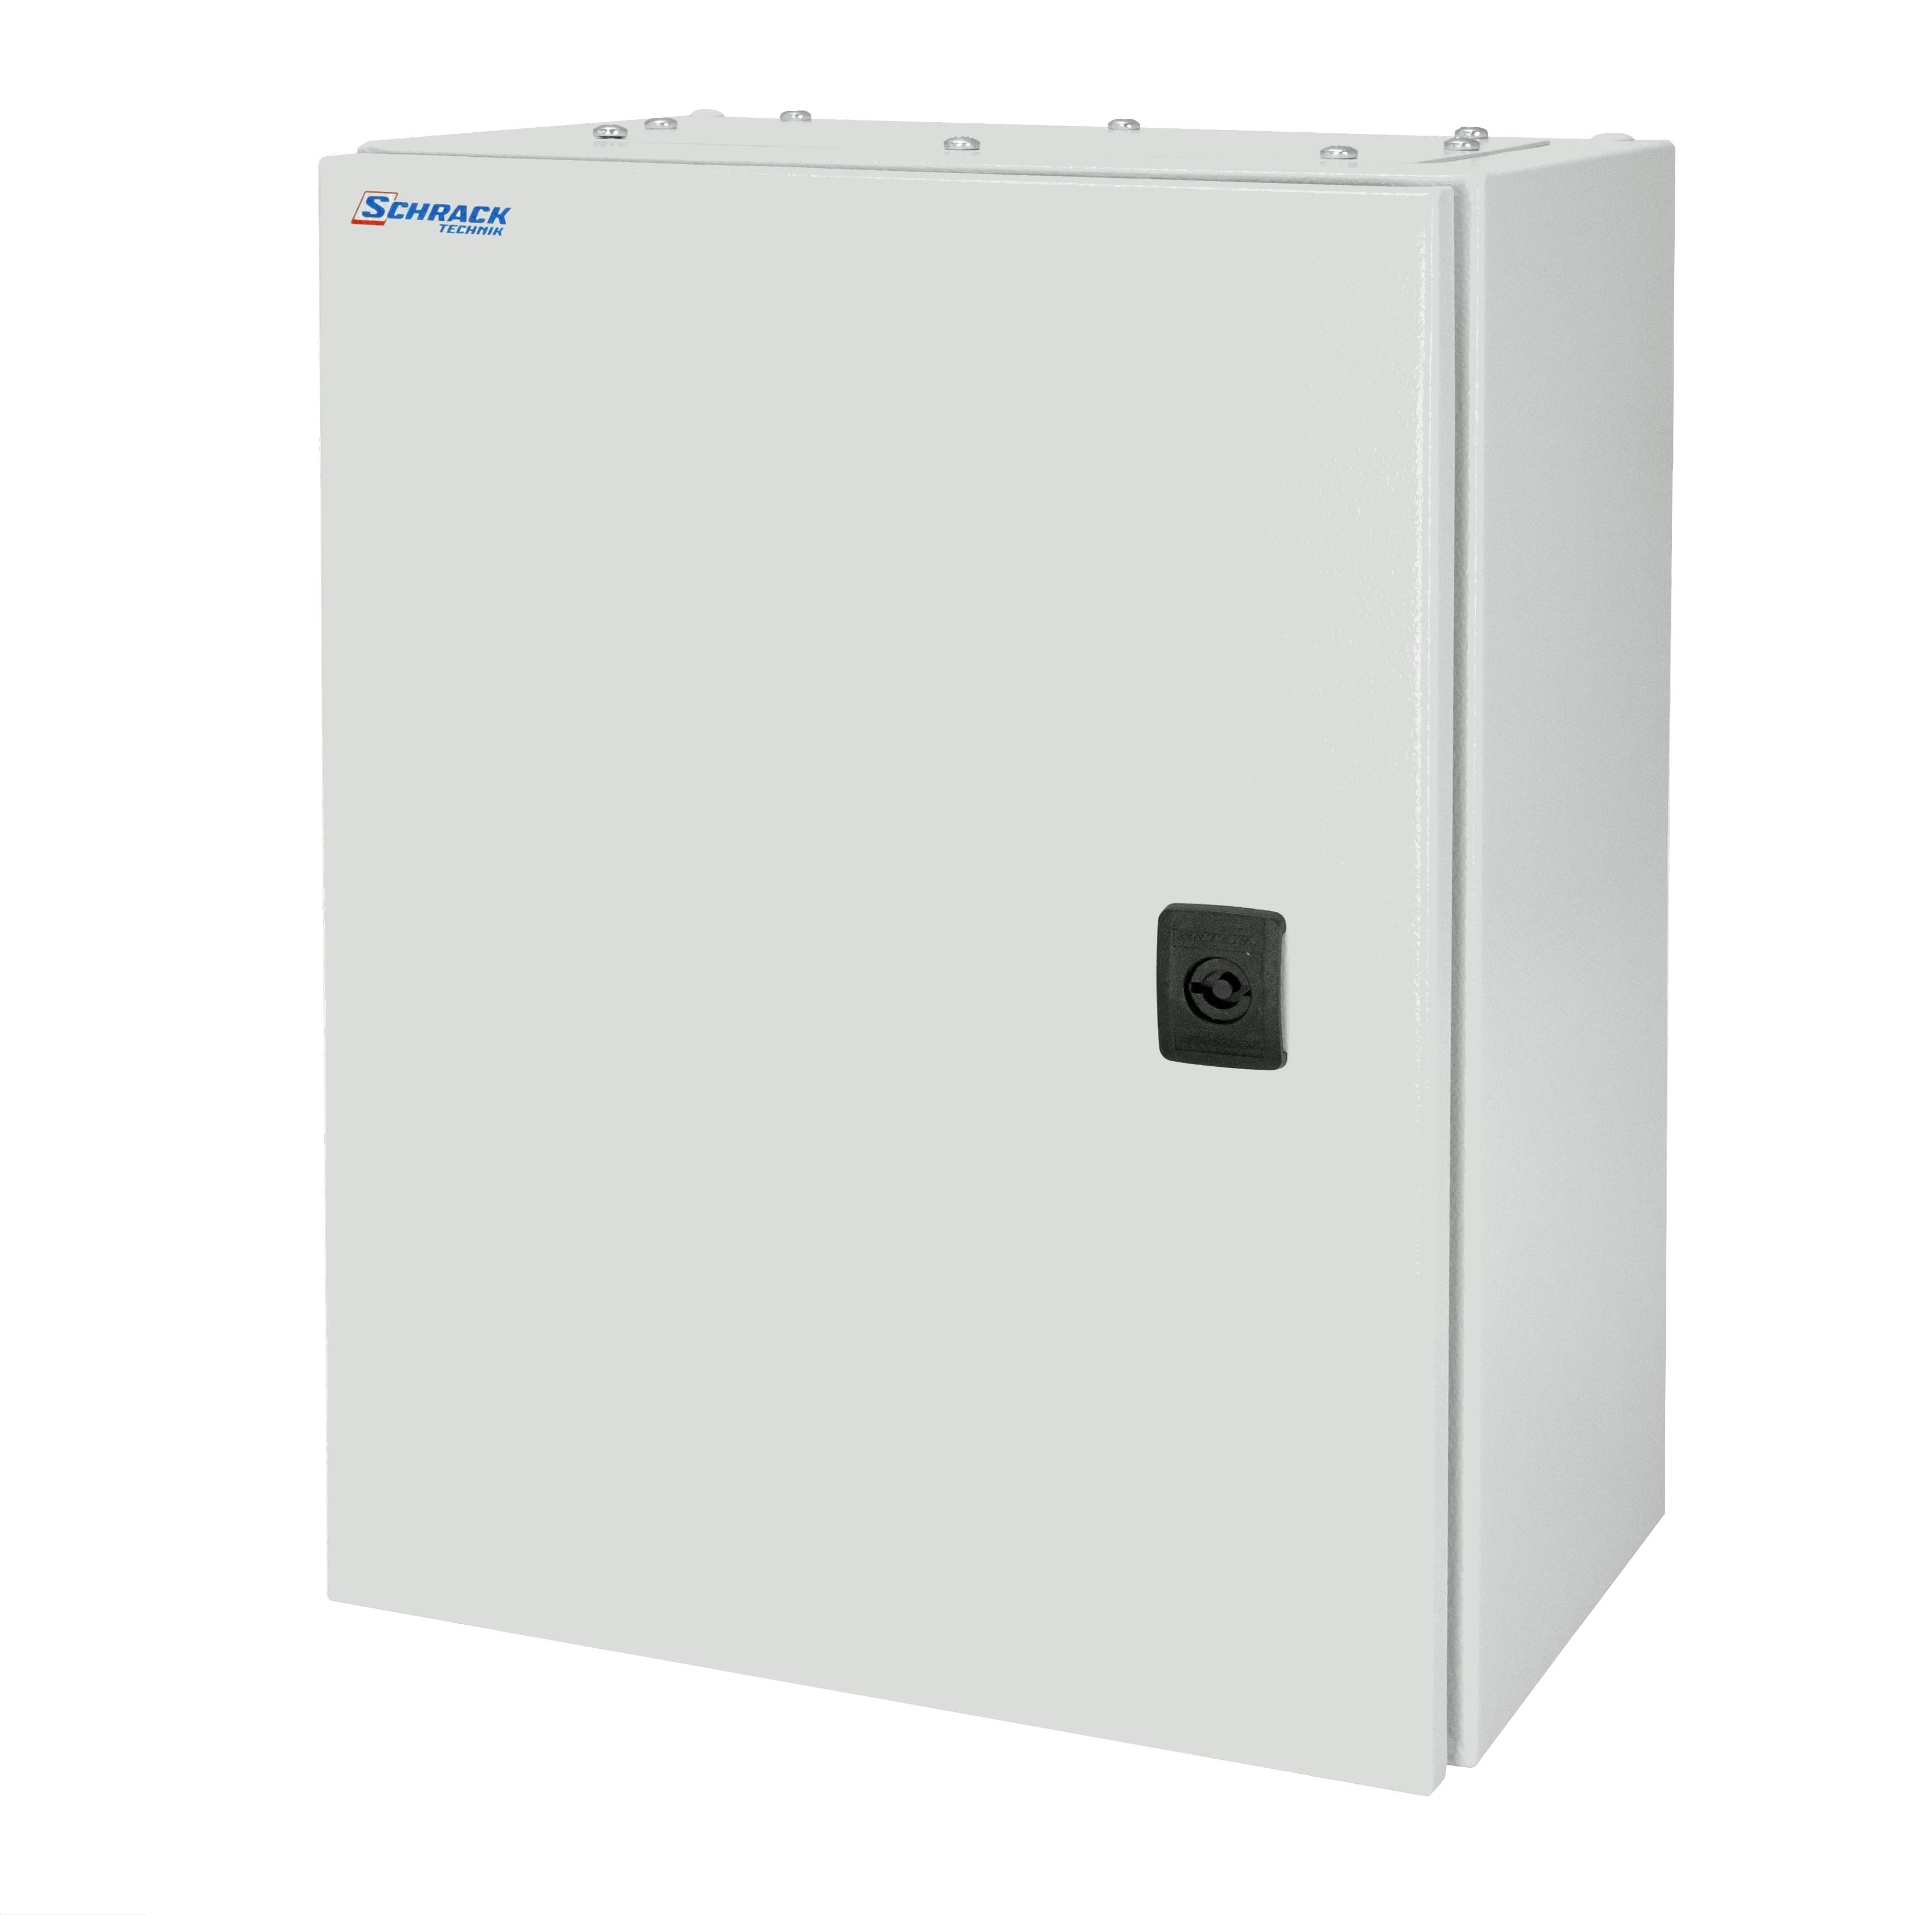 1 Stk Wandschrank Mono IP66 H=1000 B=600 T=300 Stahlblech WSM1006300